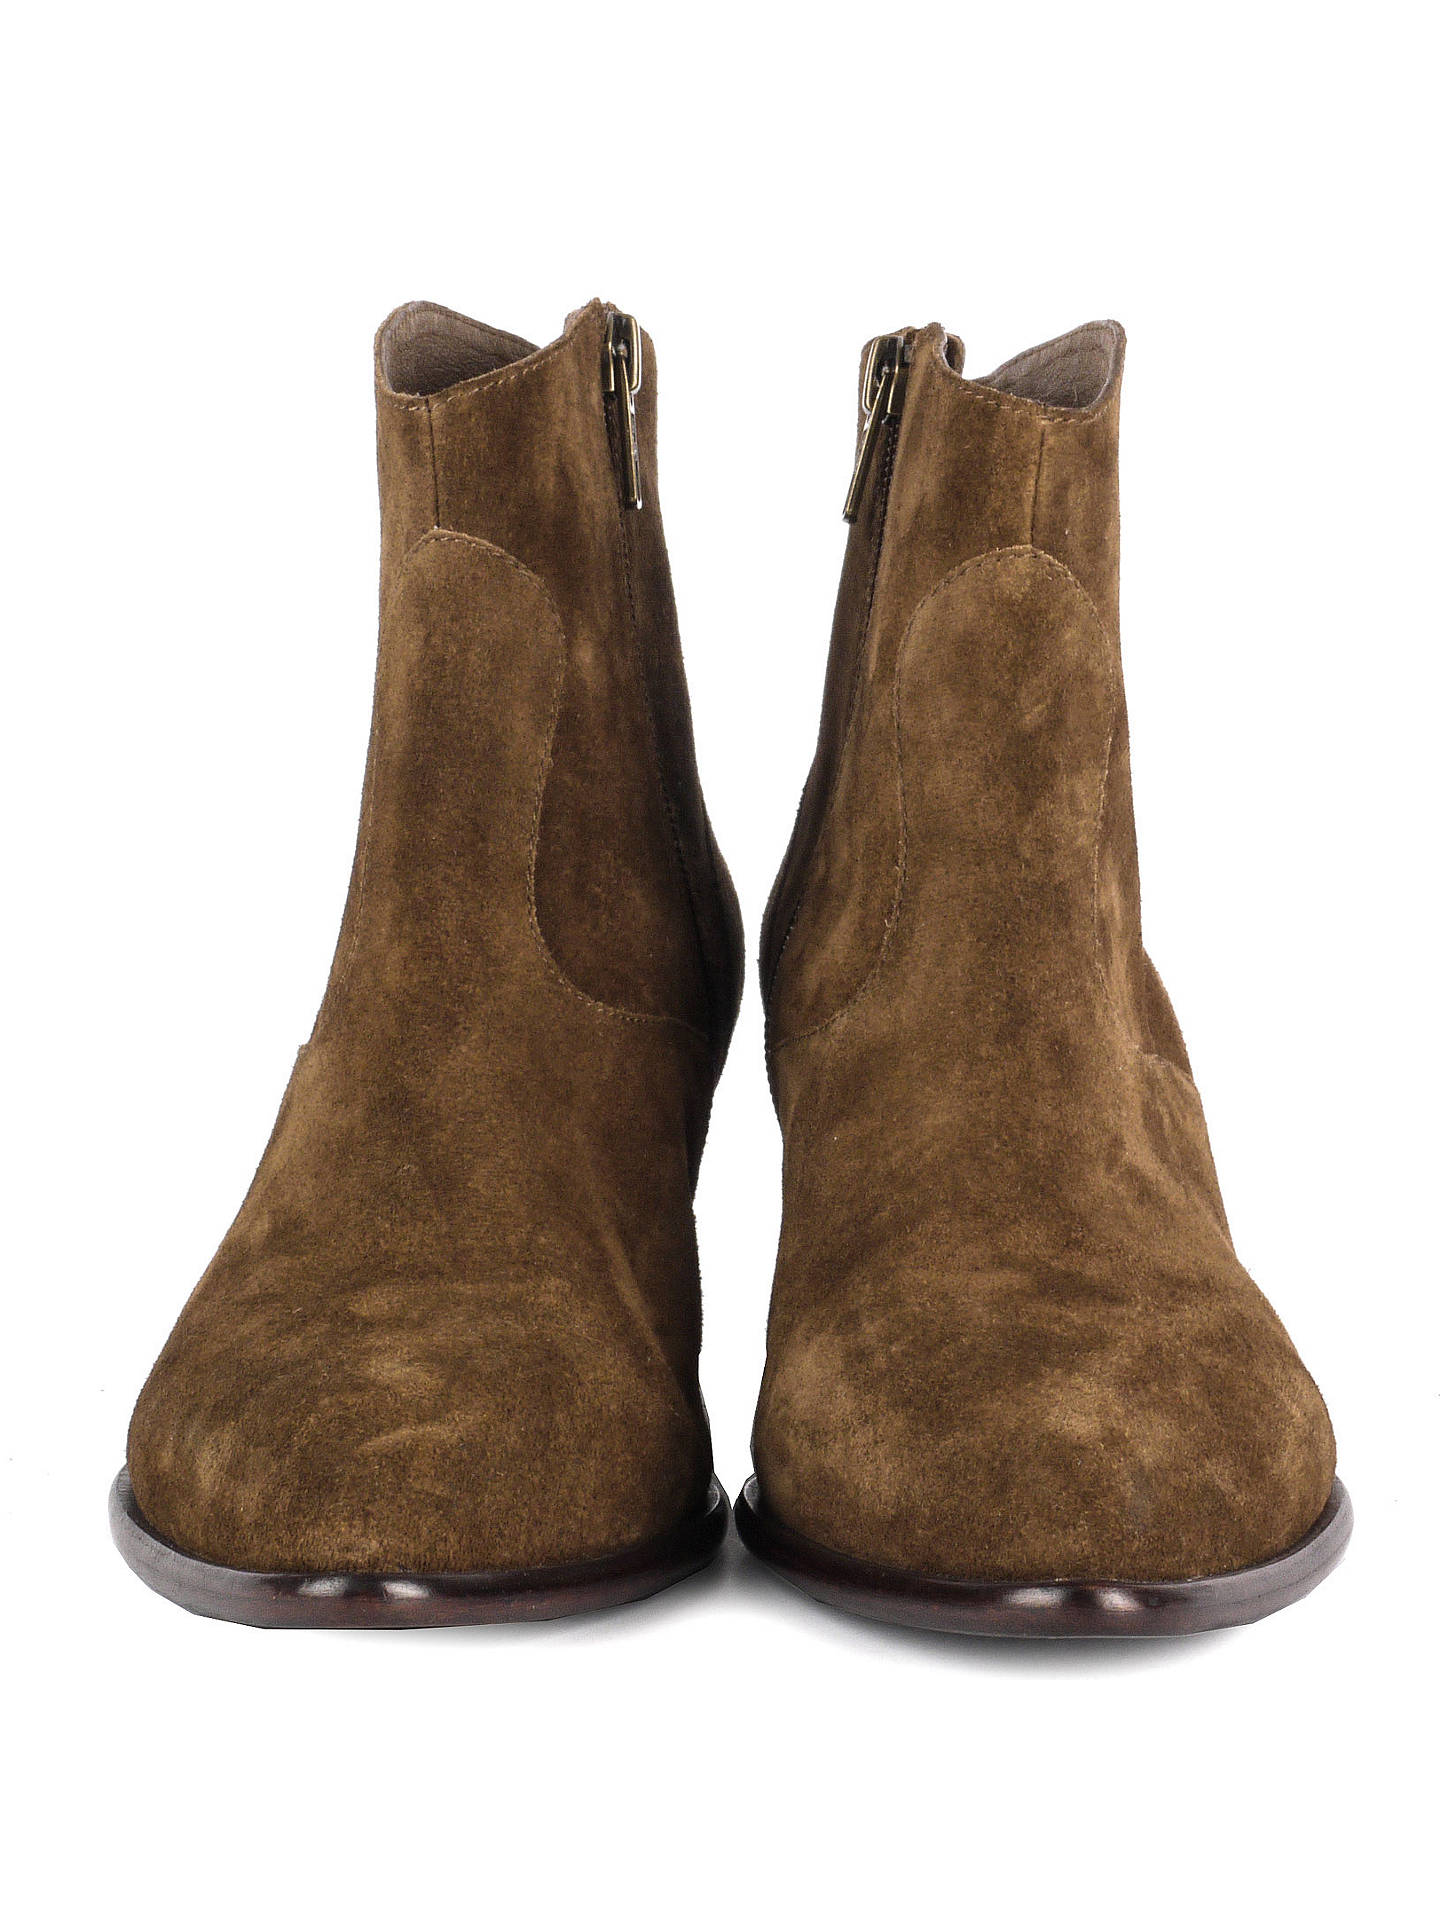 5eb6b4277eb Ash Heidi Western Block Heeled Ankle Boots, Brown at John Lewis ...